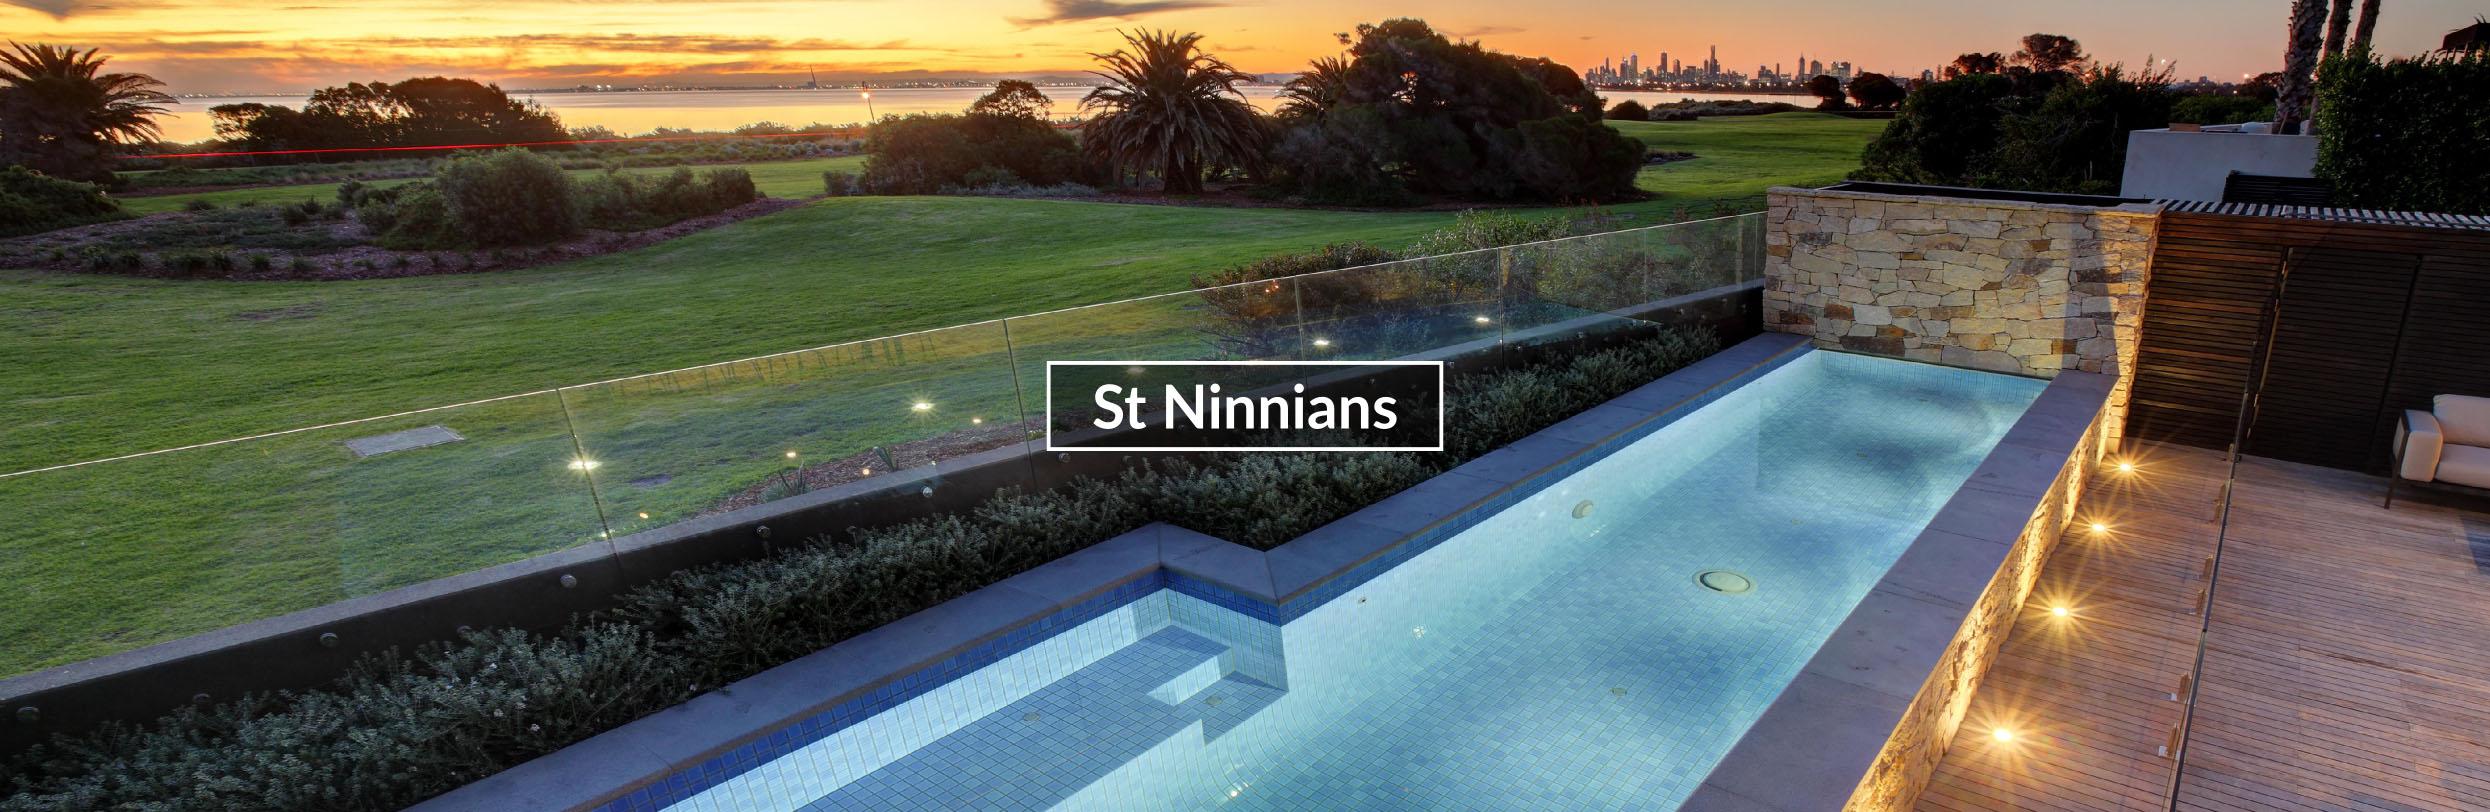 St Ninians - Kiama Pools Swimming Pool Project